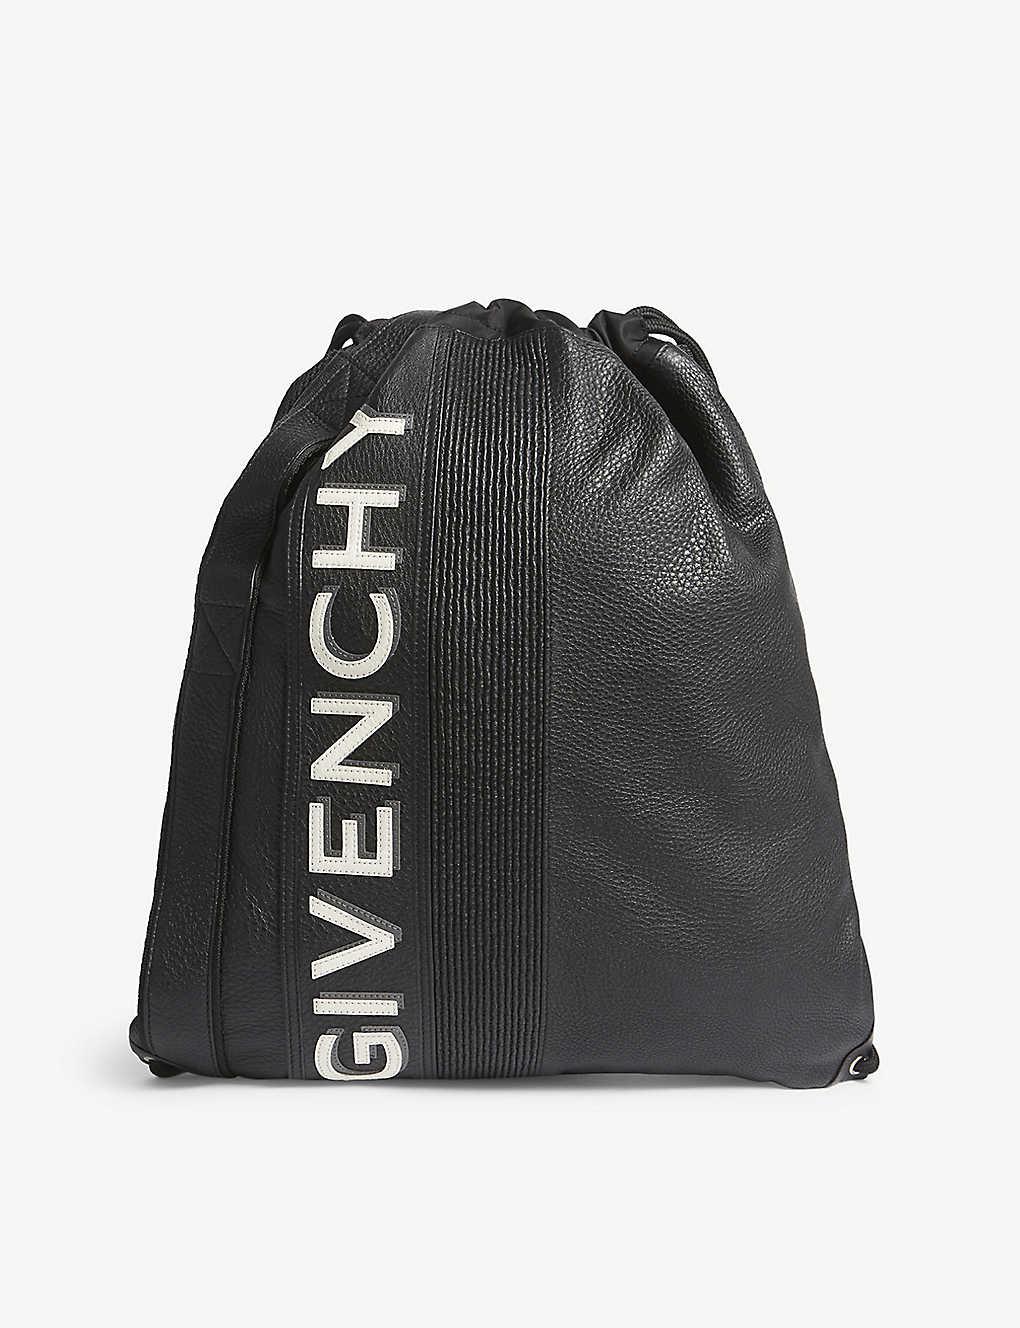 9dc2c16527ab93 GIVENCHY - MC3 leather drawstring bag | Selfridges.com